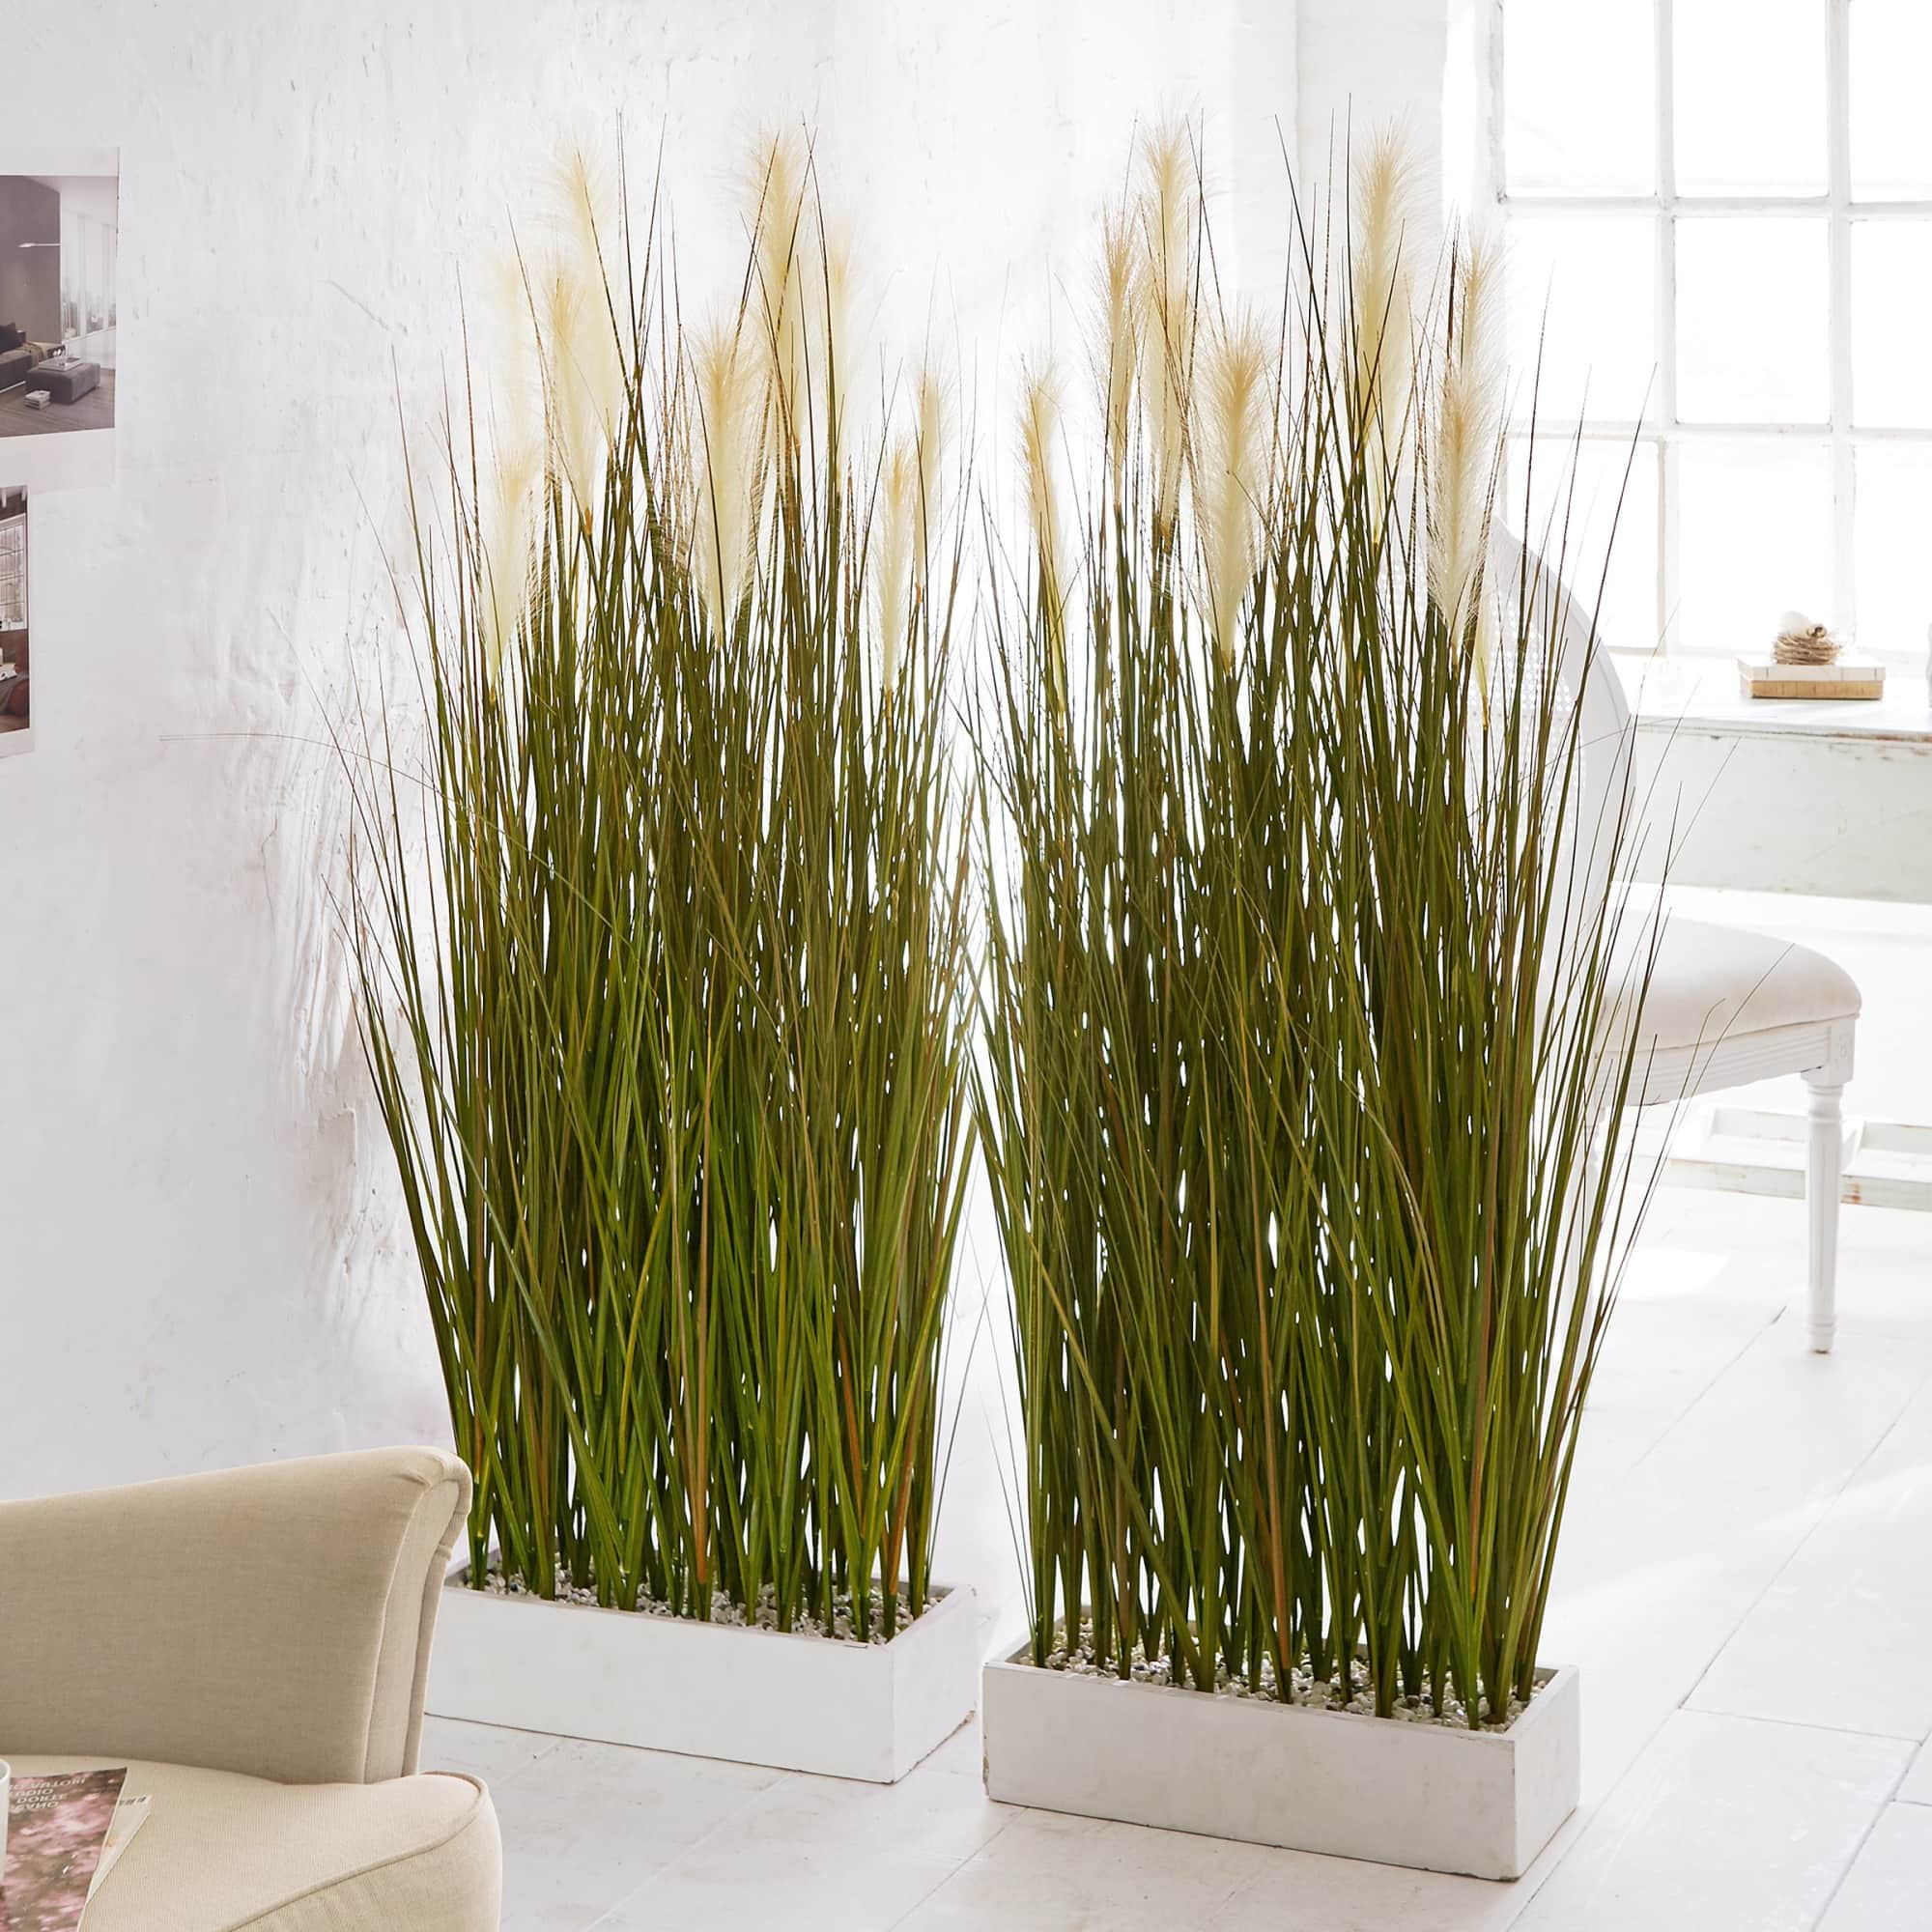 Kunstpflanze Raumtrenner Gras Raumteiler Kunststoff Hohe Ca 153 Cm